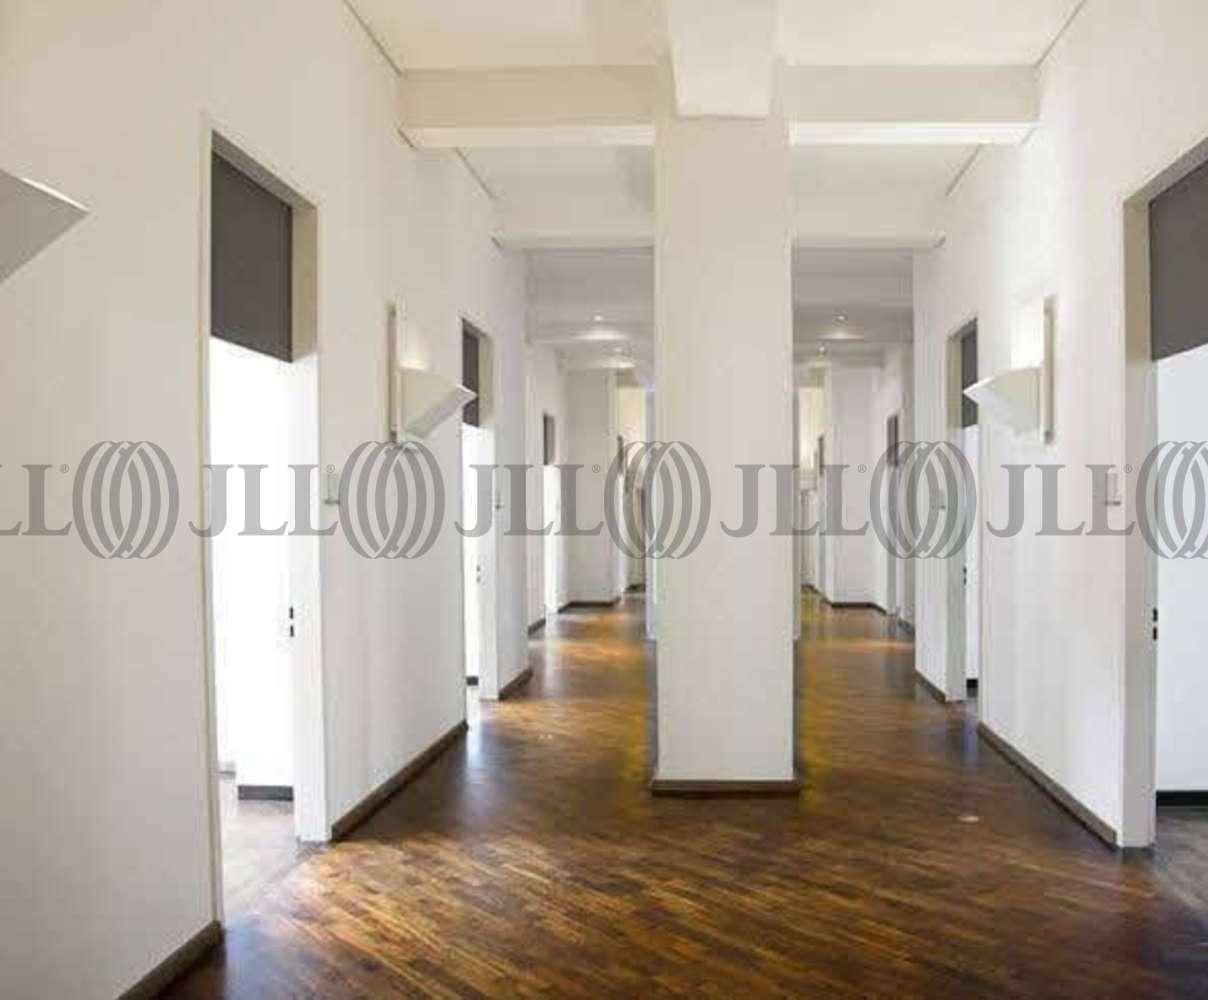 Büros Frankfurt am main, 60486 - Büro - Frankfurt am Main, Bockenheim - F0133 - 9583827